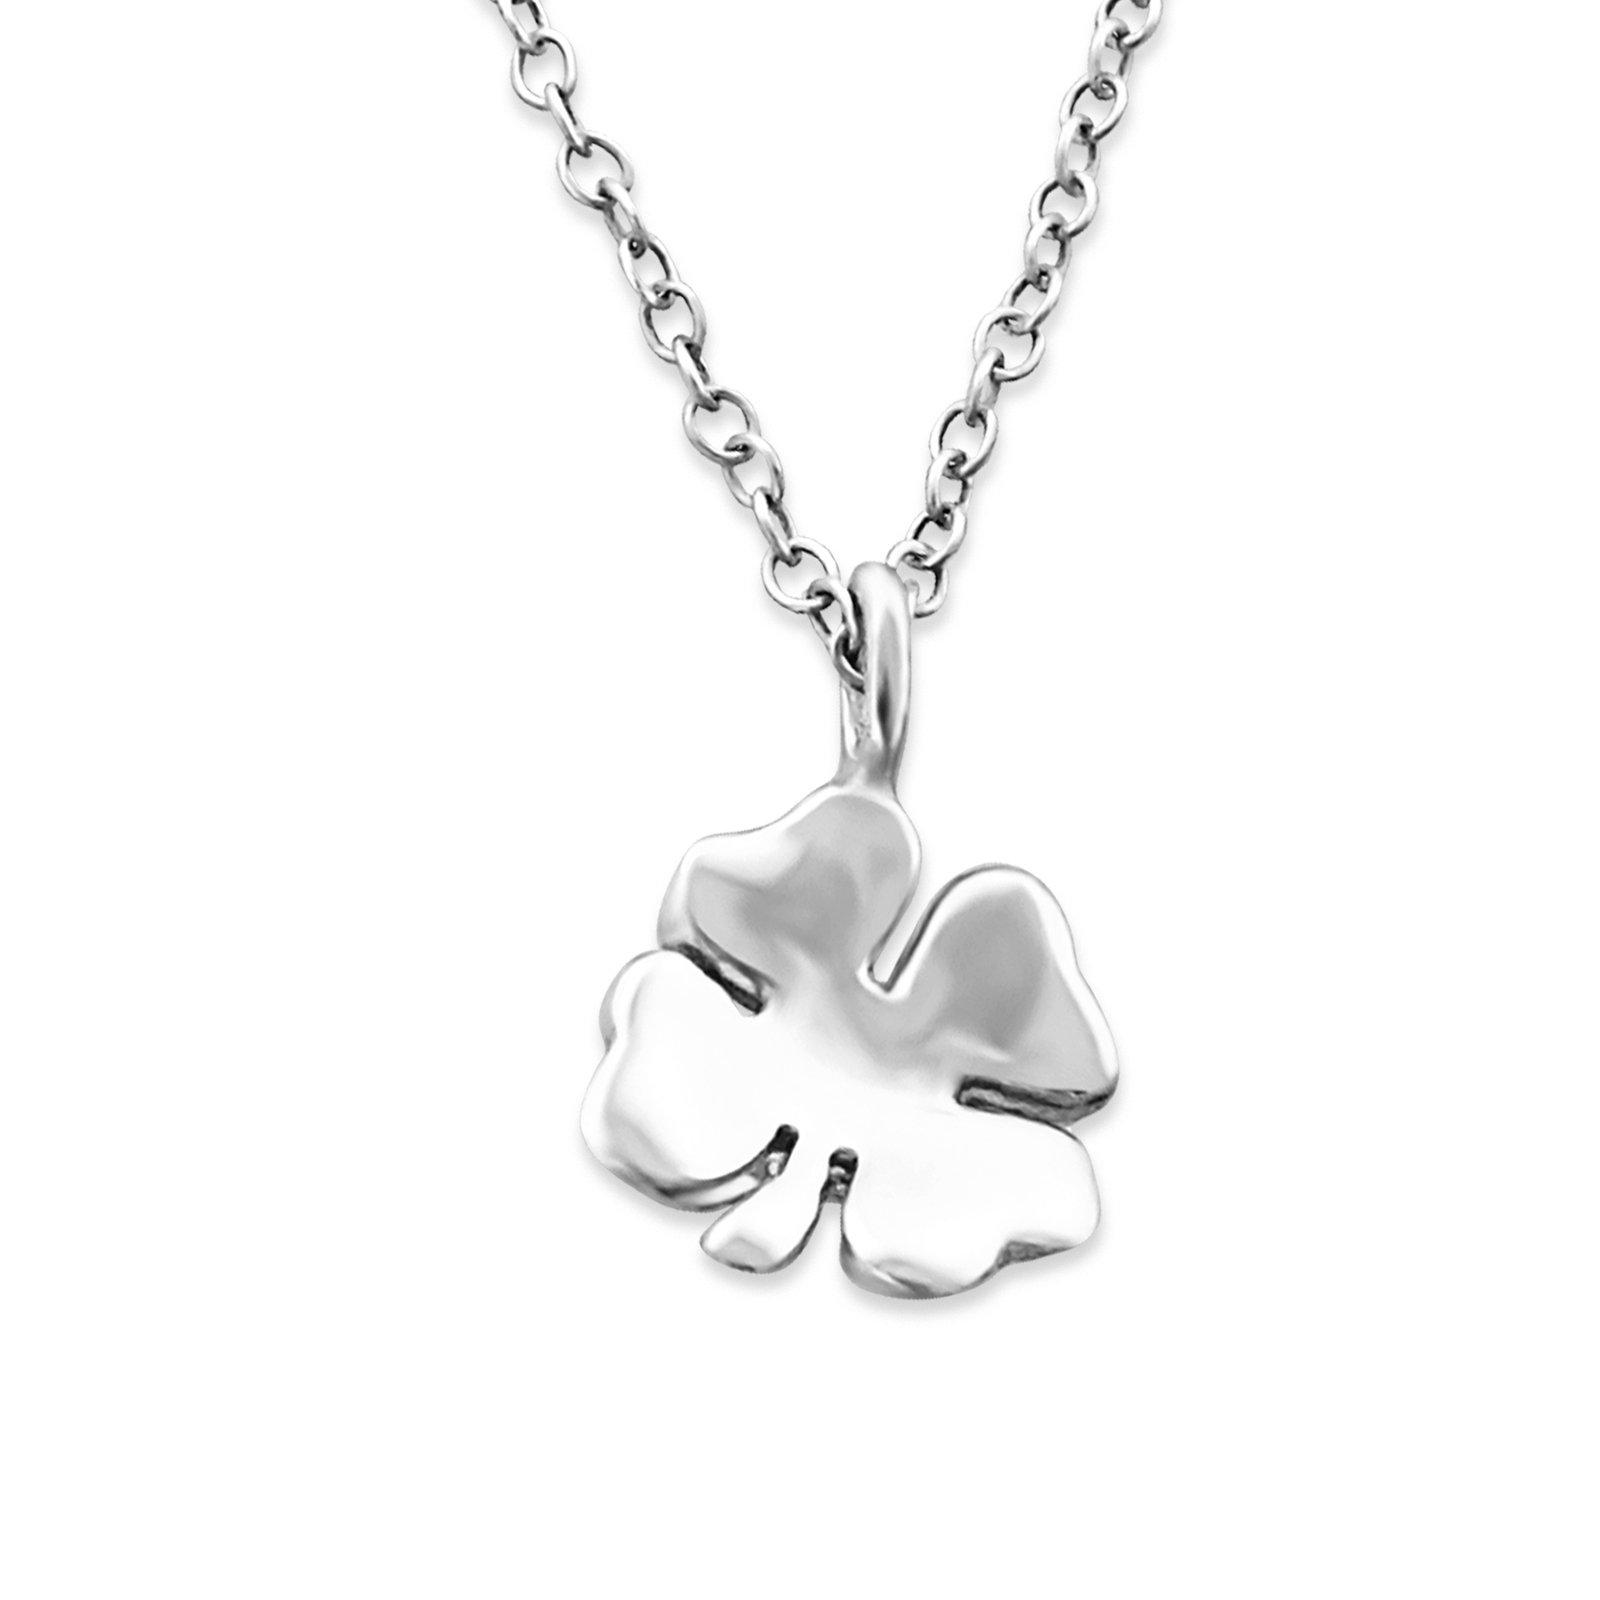 Atik Jewelry Silver Shamrock Necklace